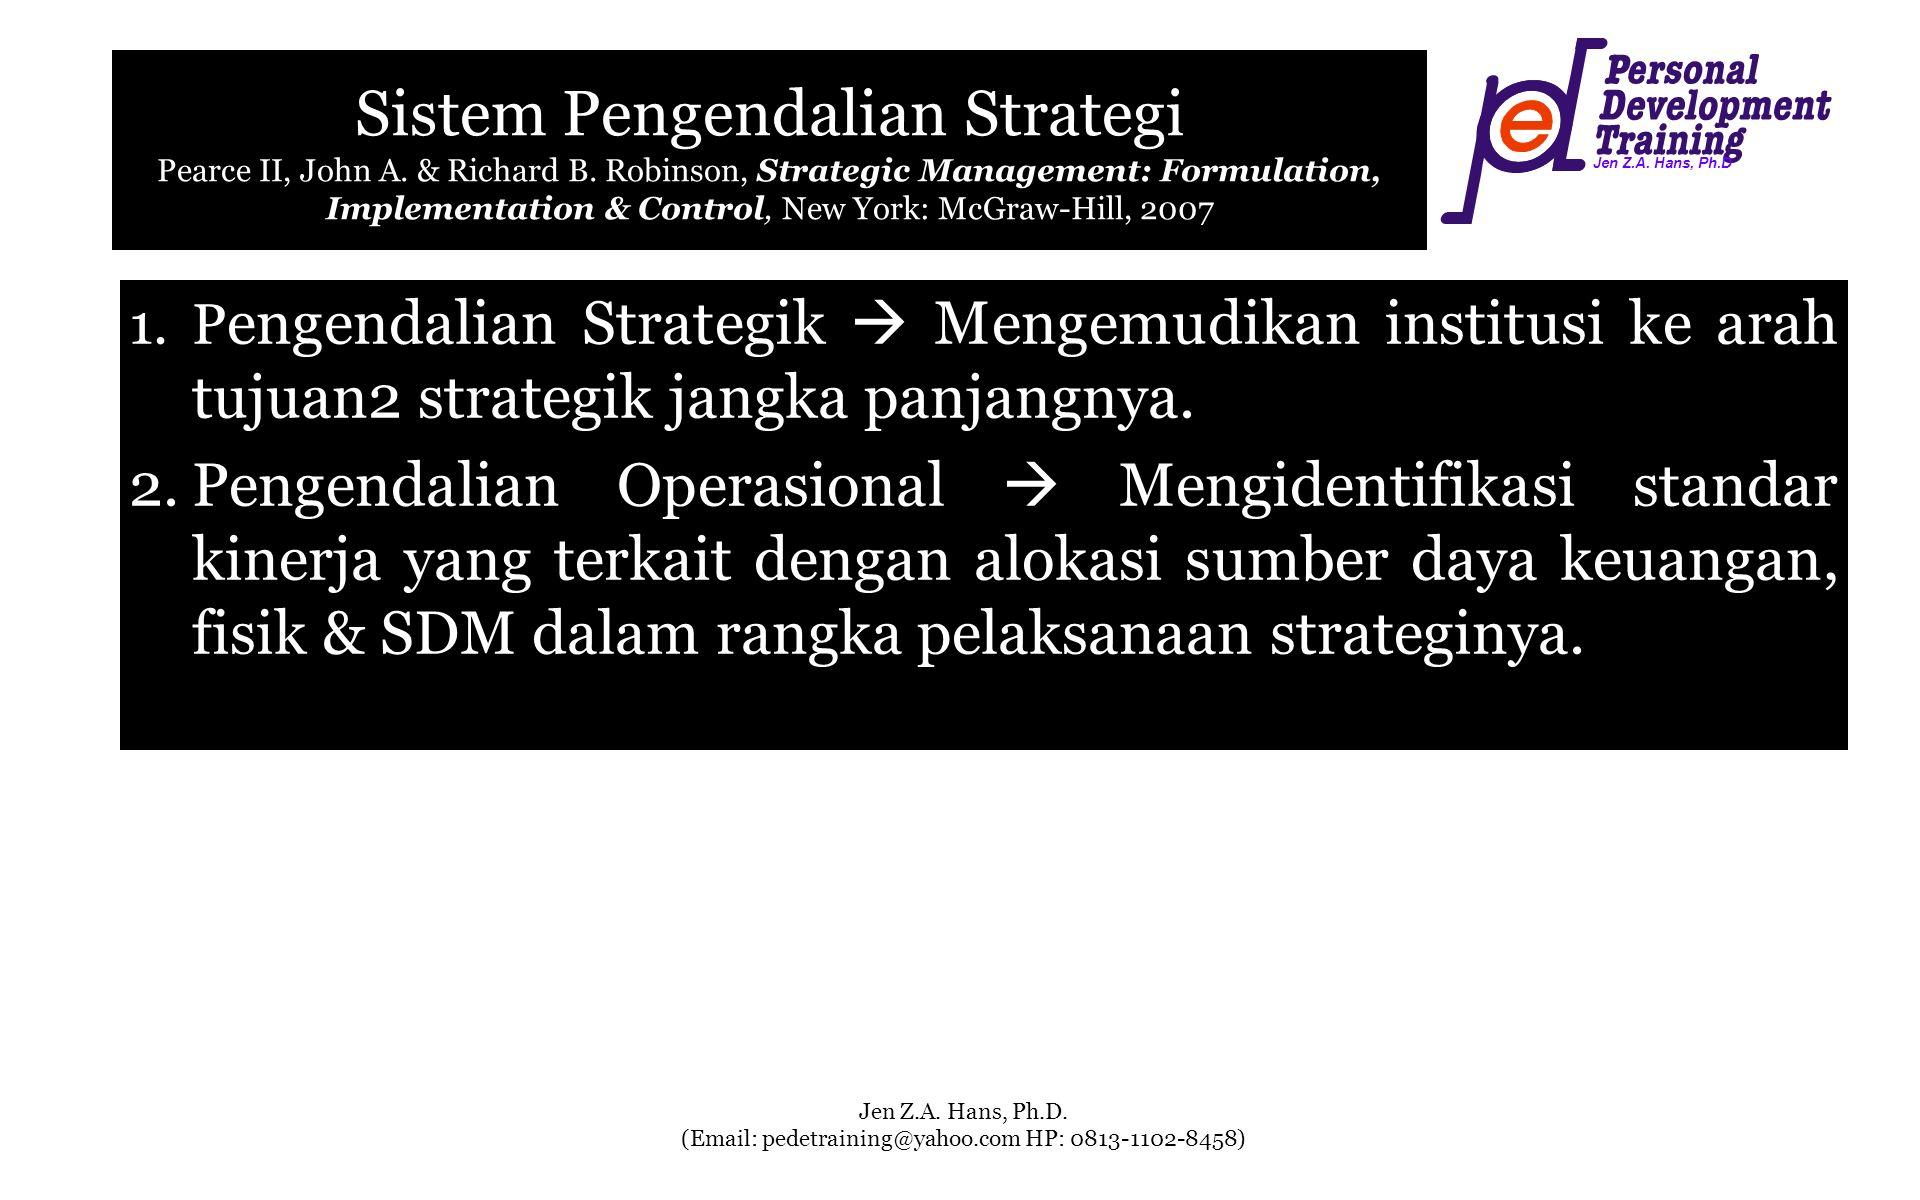 Jen Z.A. Hans, Ph.D Jen Z.A. Hans, Ph.D. (Email: pedetraining@yahoo.com HP: 0813-1102-8458) Sistem Pengendalian Strategi Pearce II, John A. & Richard